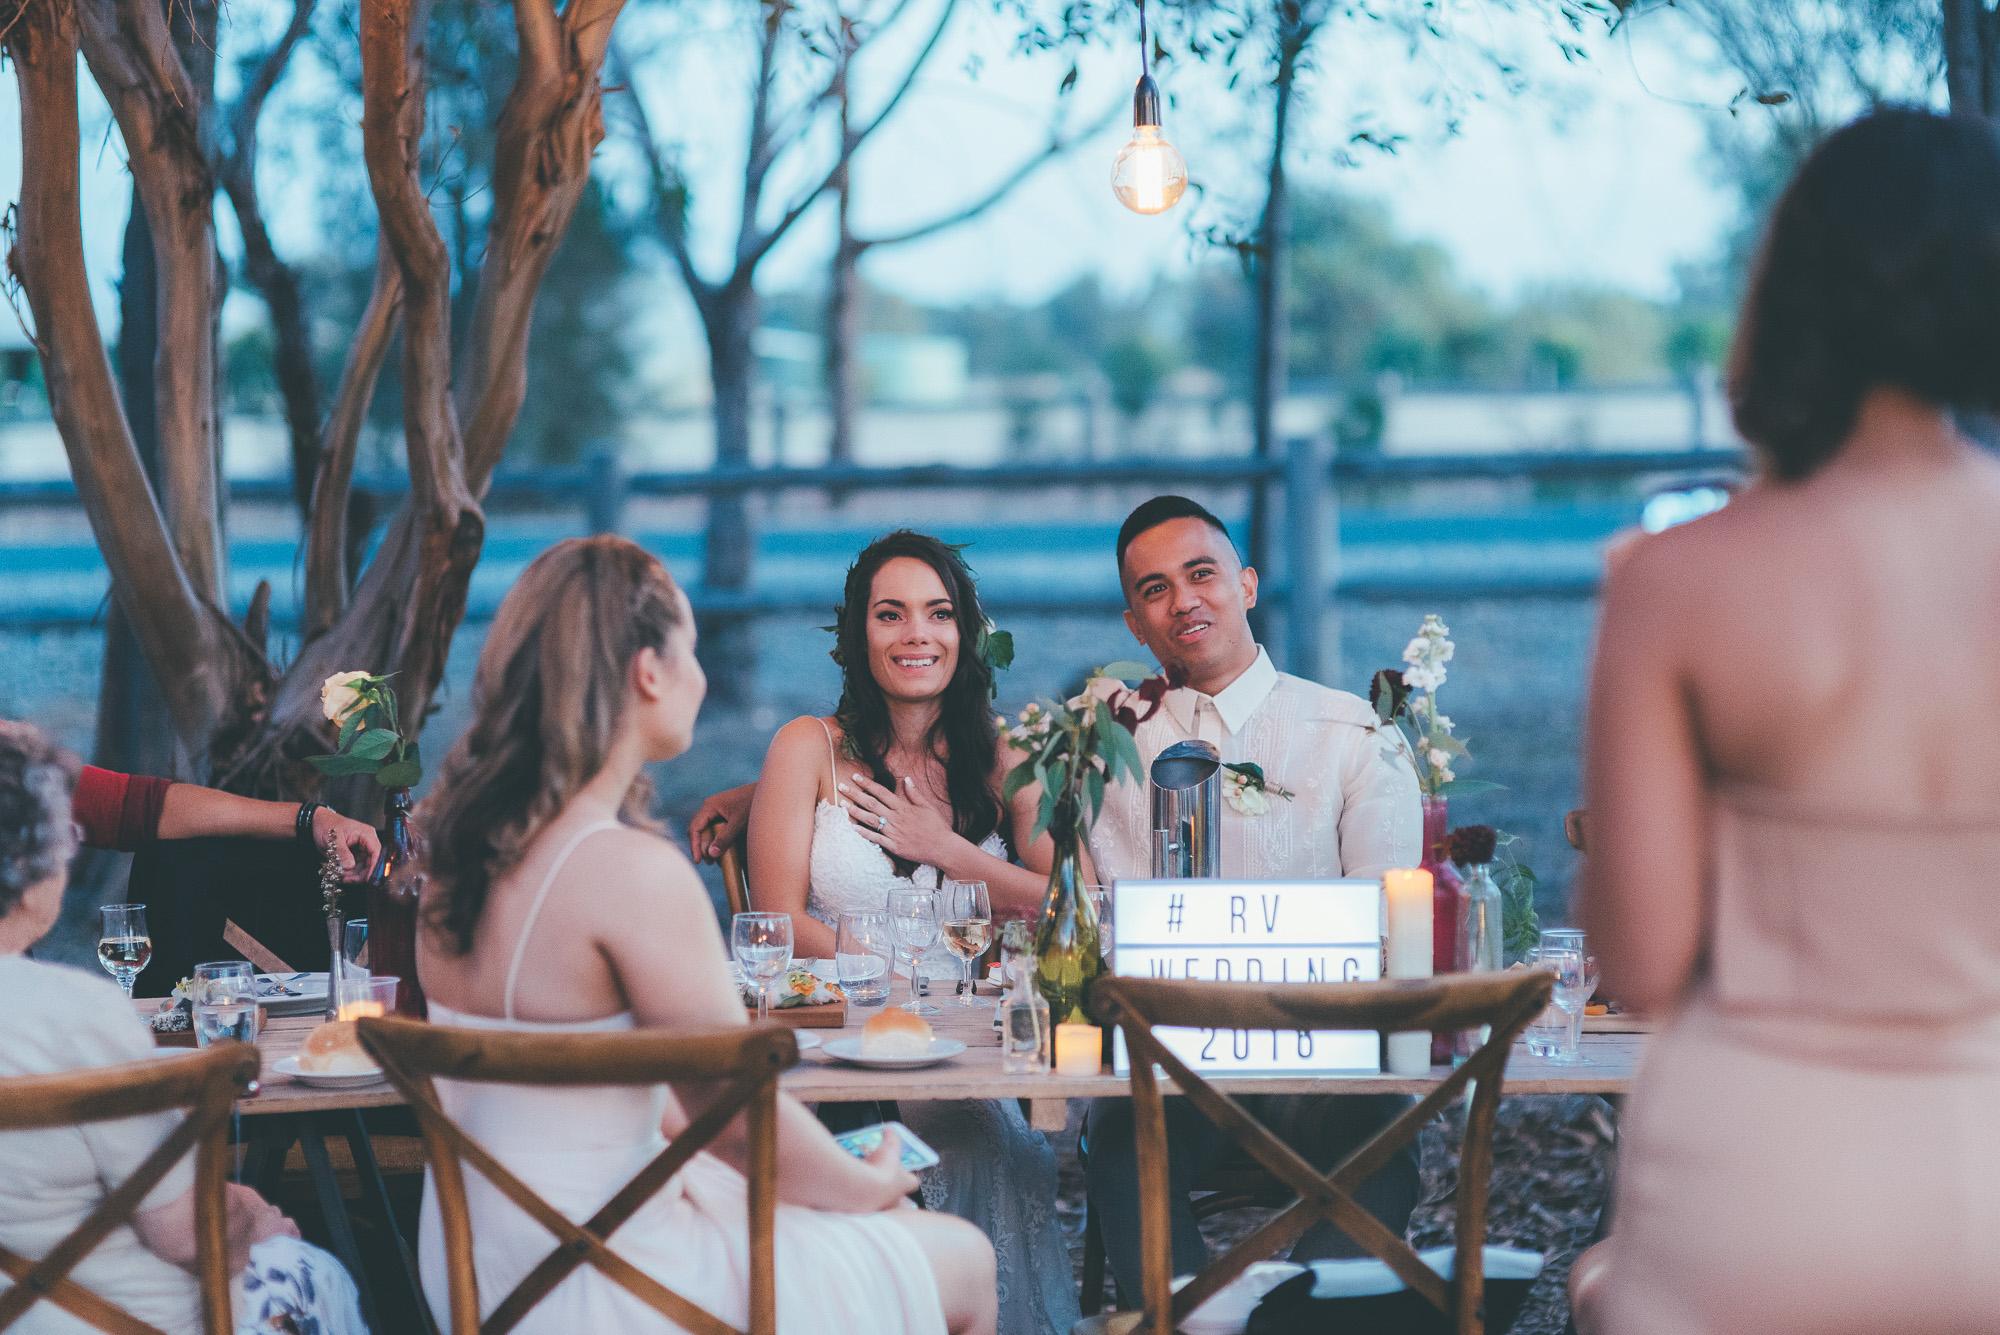 wedding-photographer-outdoor-casual-styled-los-angeles-australia-california-international-earthbound -87.jpg